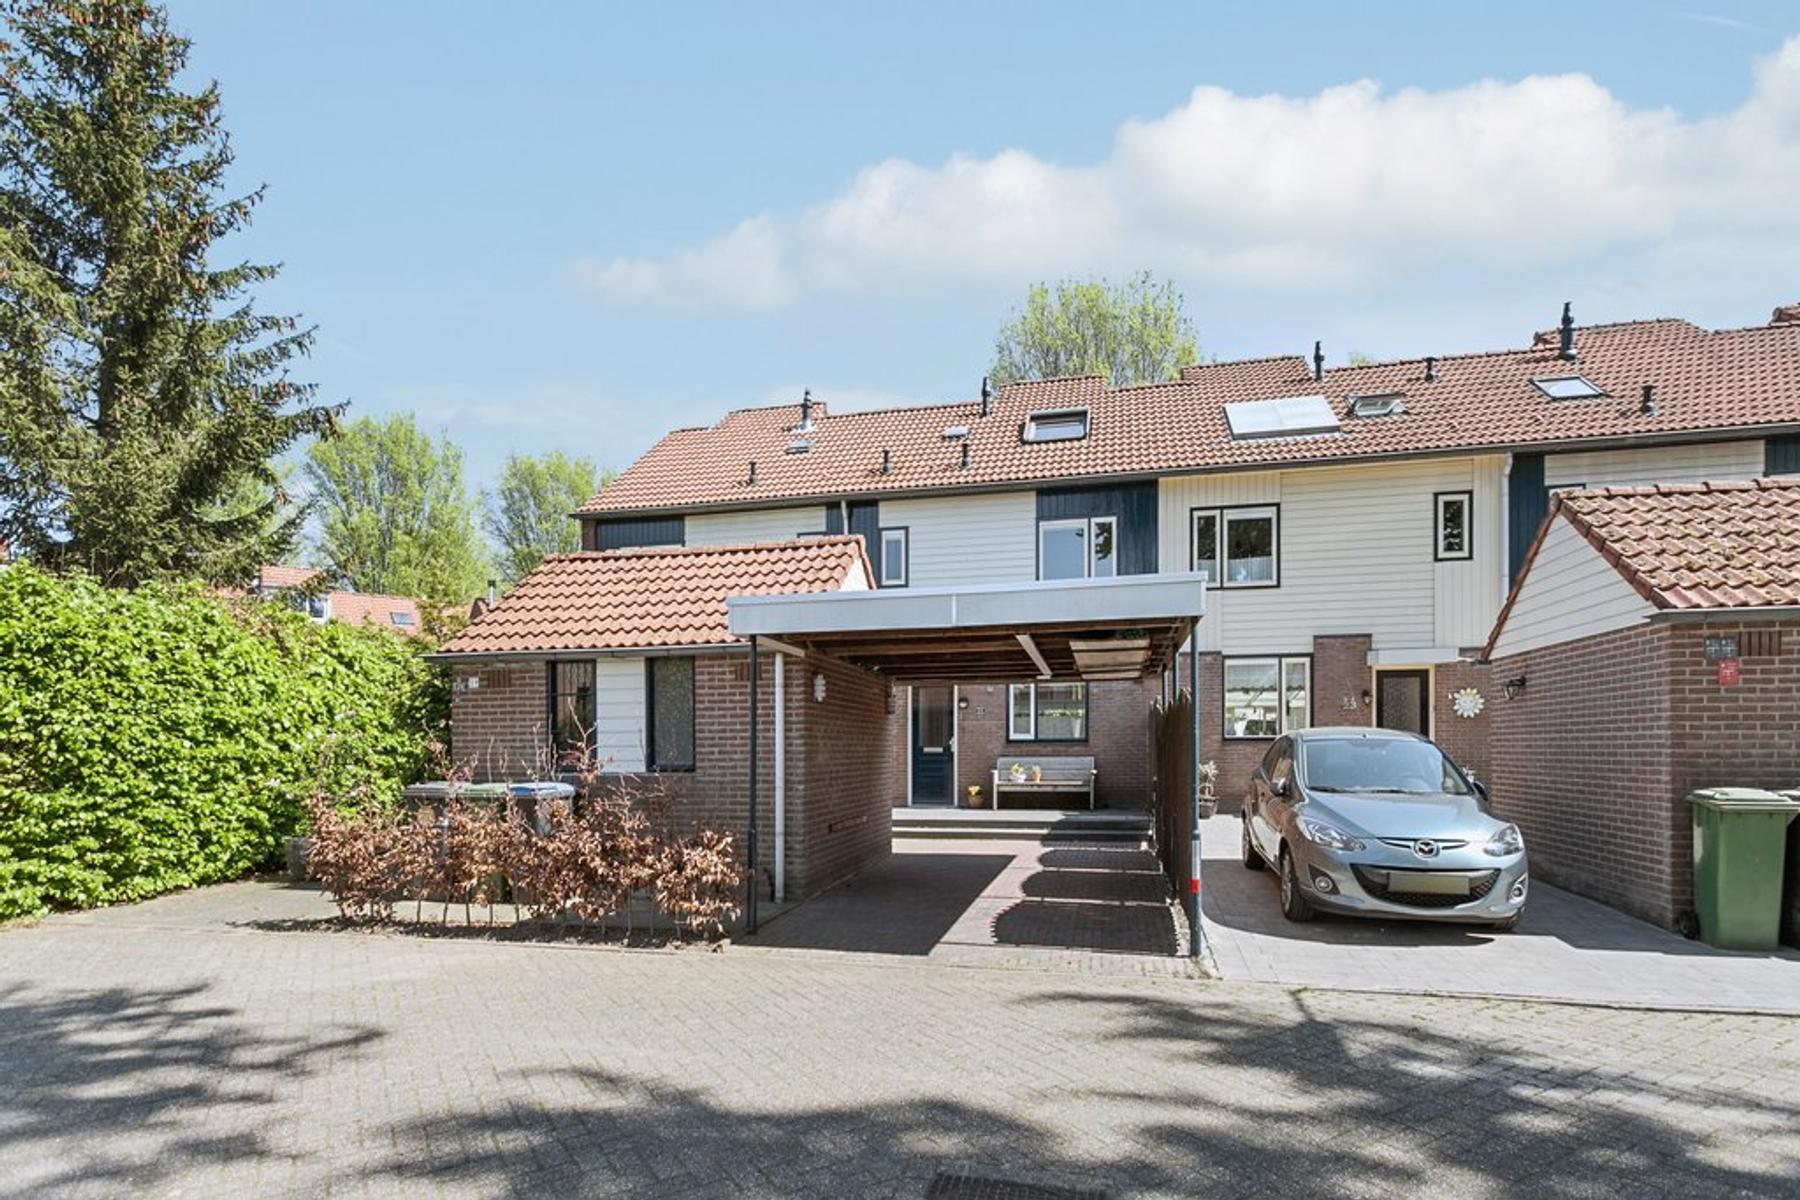 Wanroijhof 21 in Arnhem 6844 DN